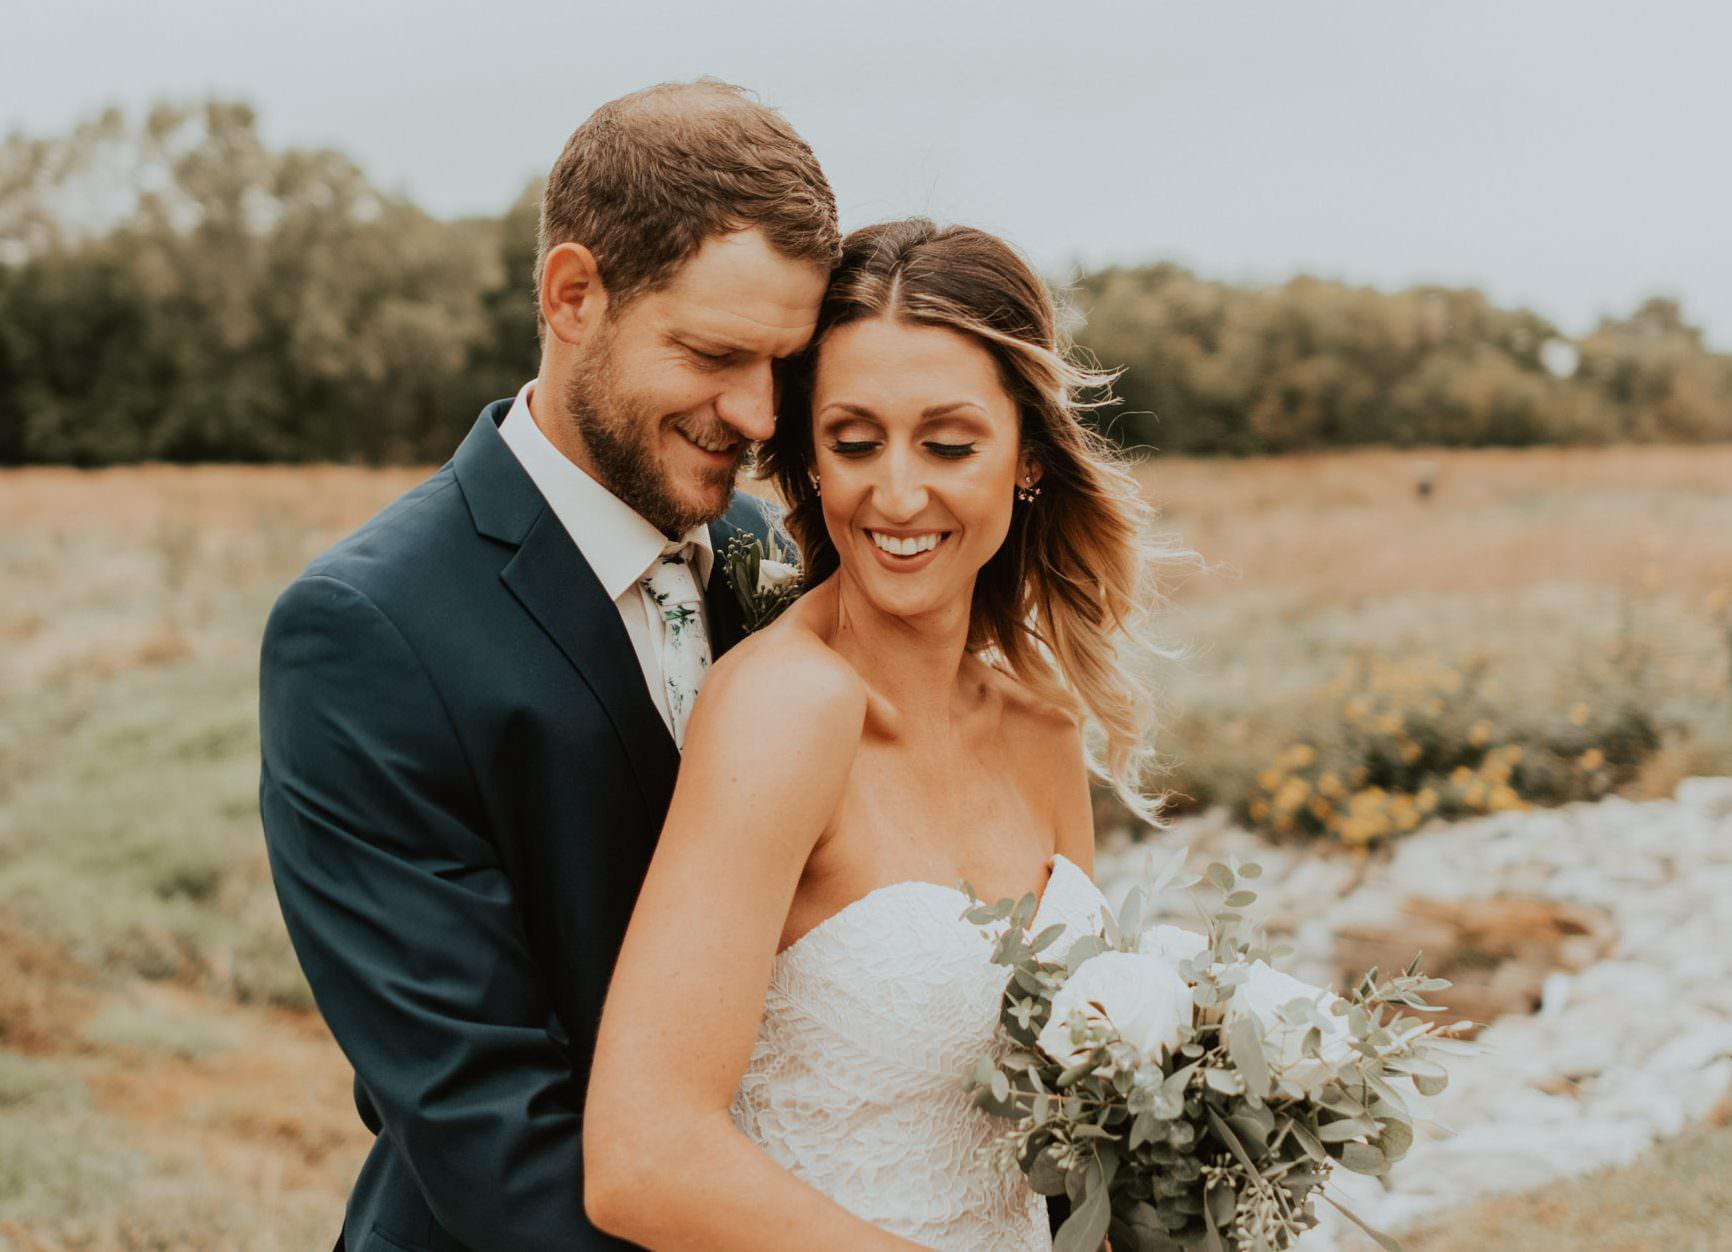 bride and groom portraits from wedding in lincoln nebraska